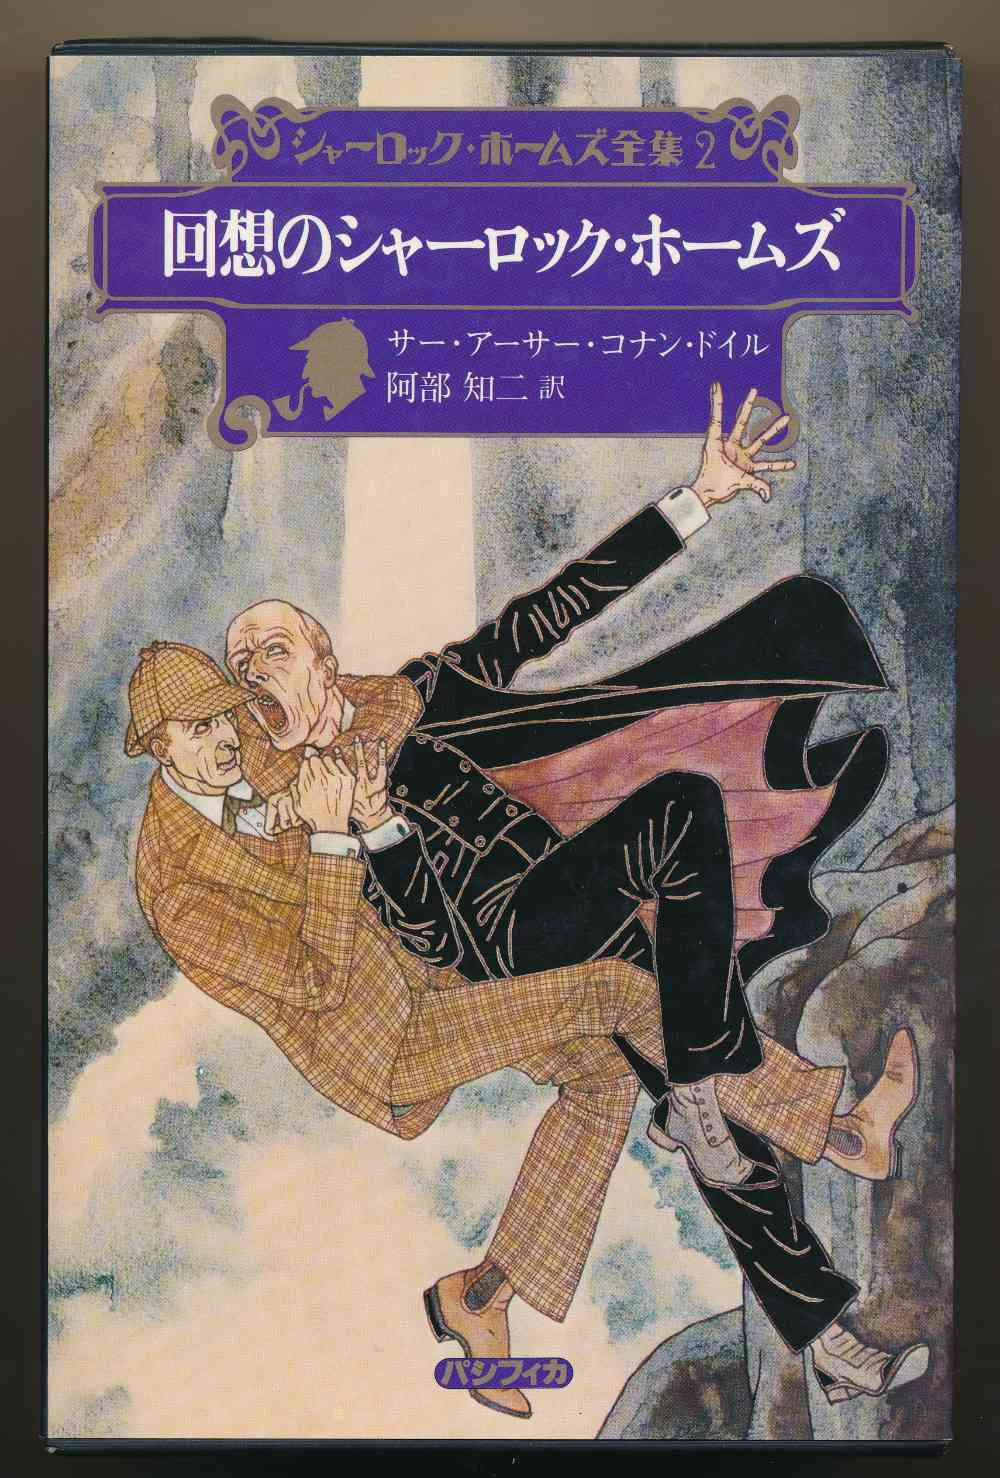 Kaiso no Sherlock Holmes